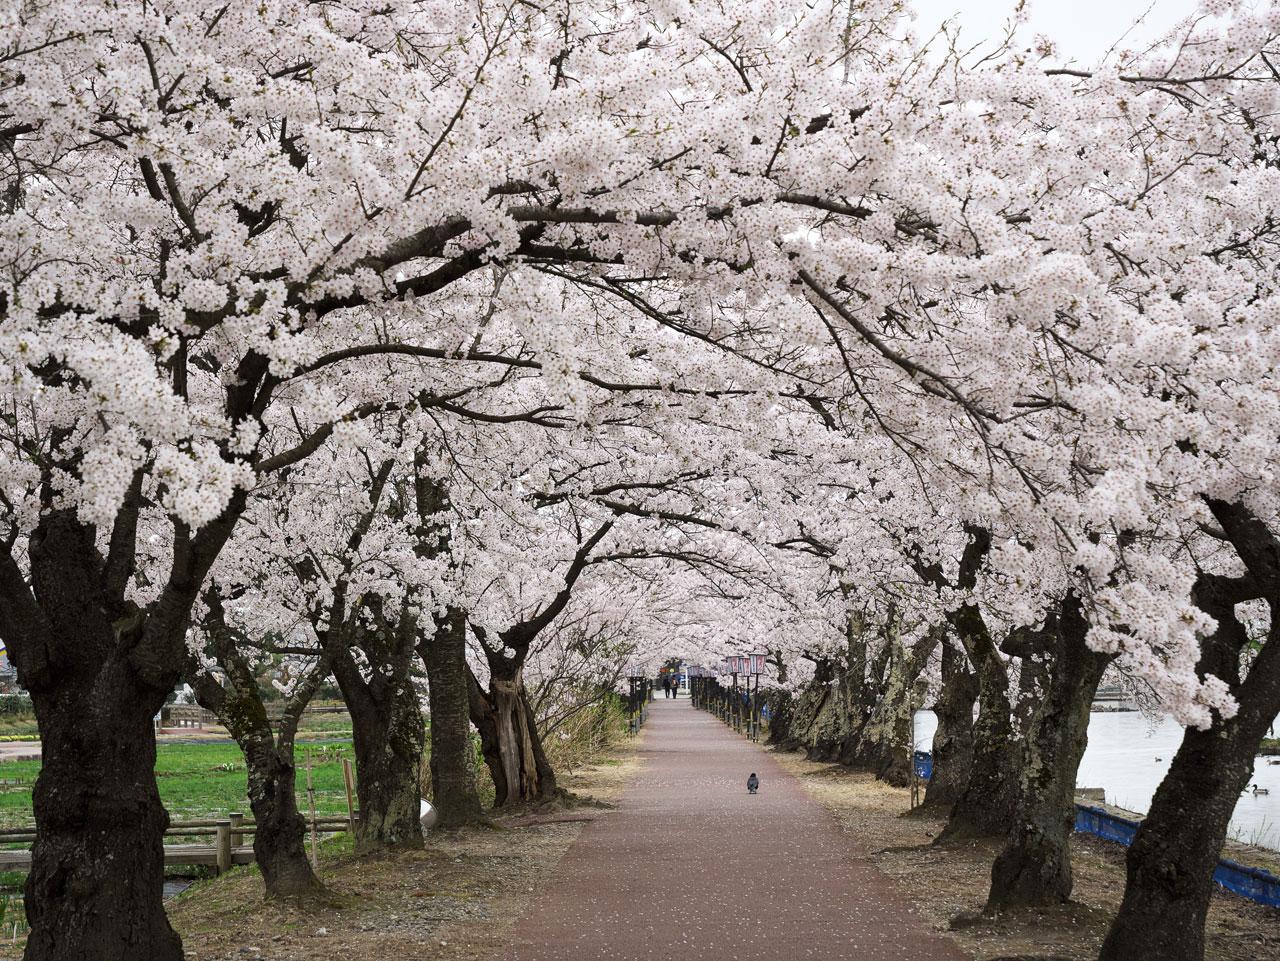 瓢湖の桜2:LUMIX DMC-GX7MK2+LEICA DG VARIO-ELMARIT 12-60mm/F2.8-4.0